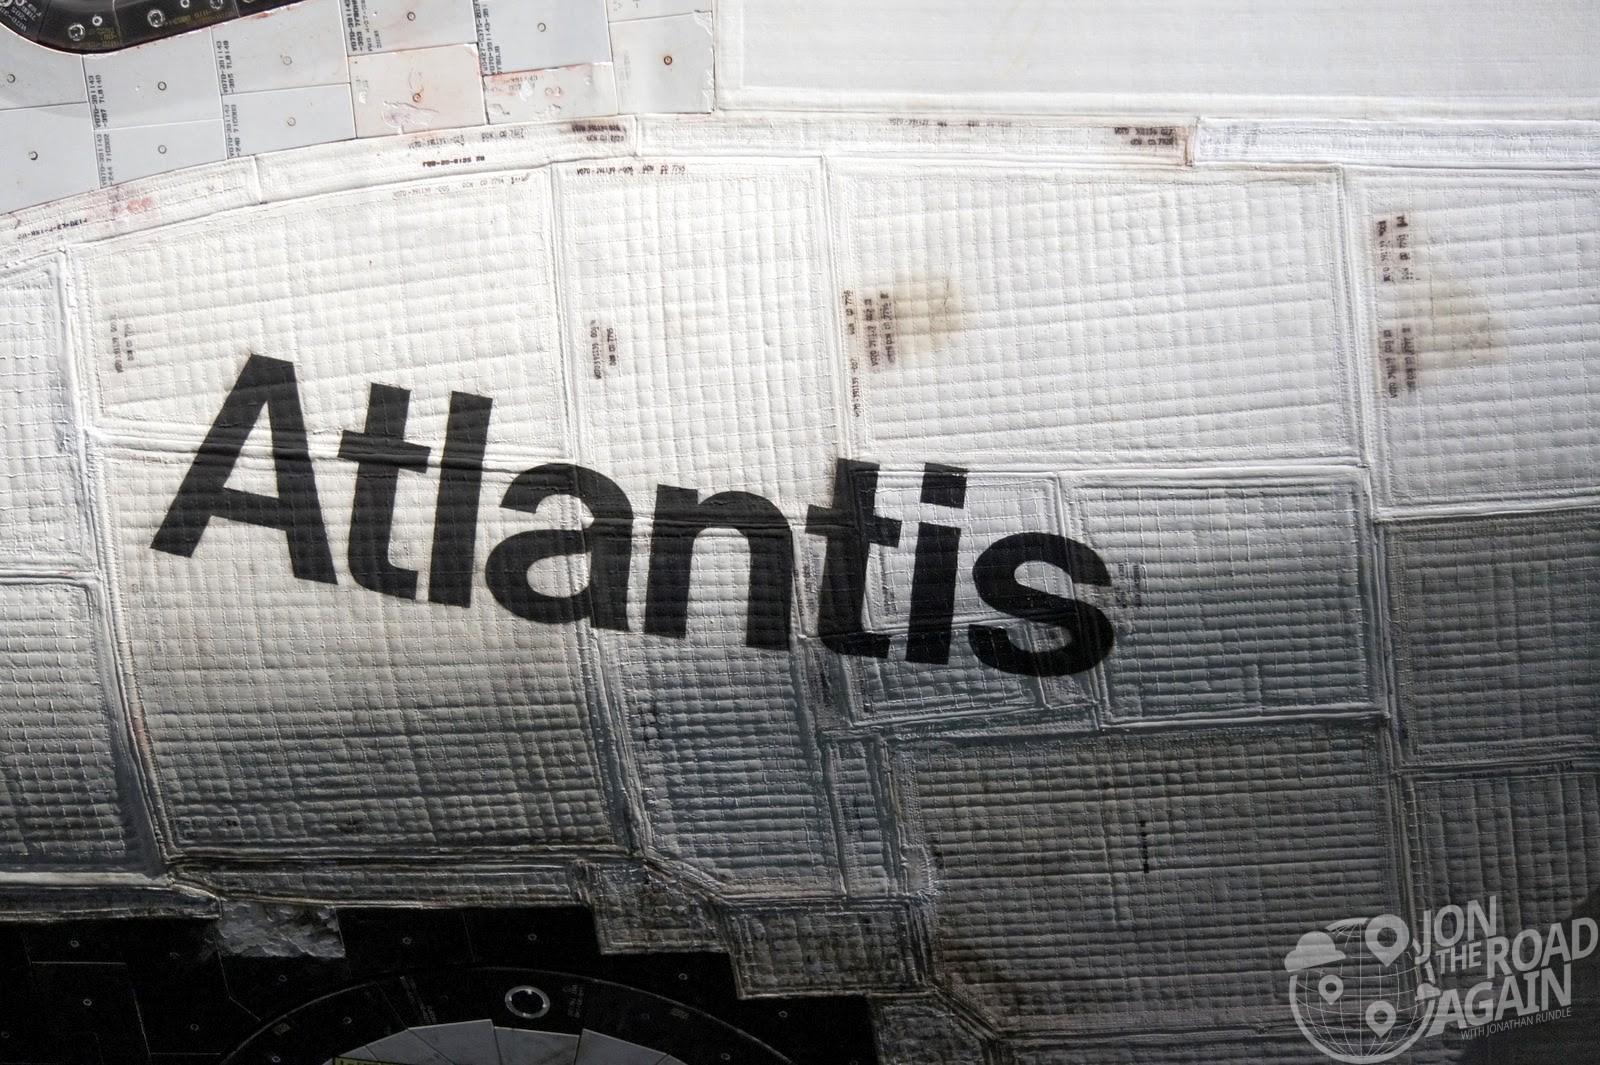 Atlantis Space shuttle display